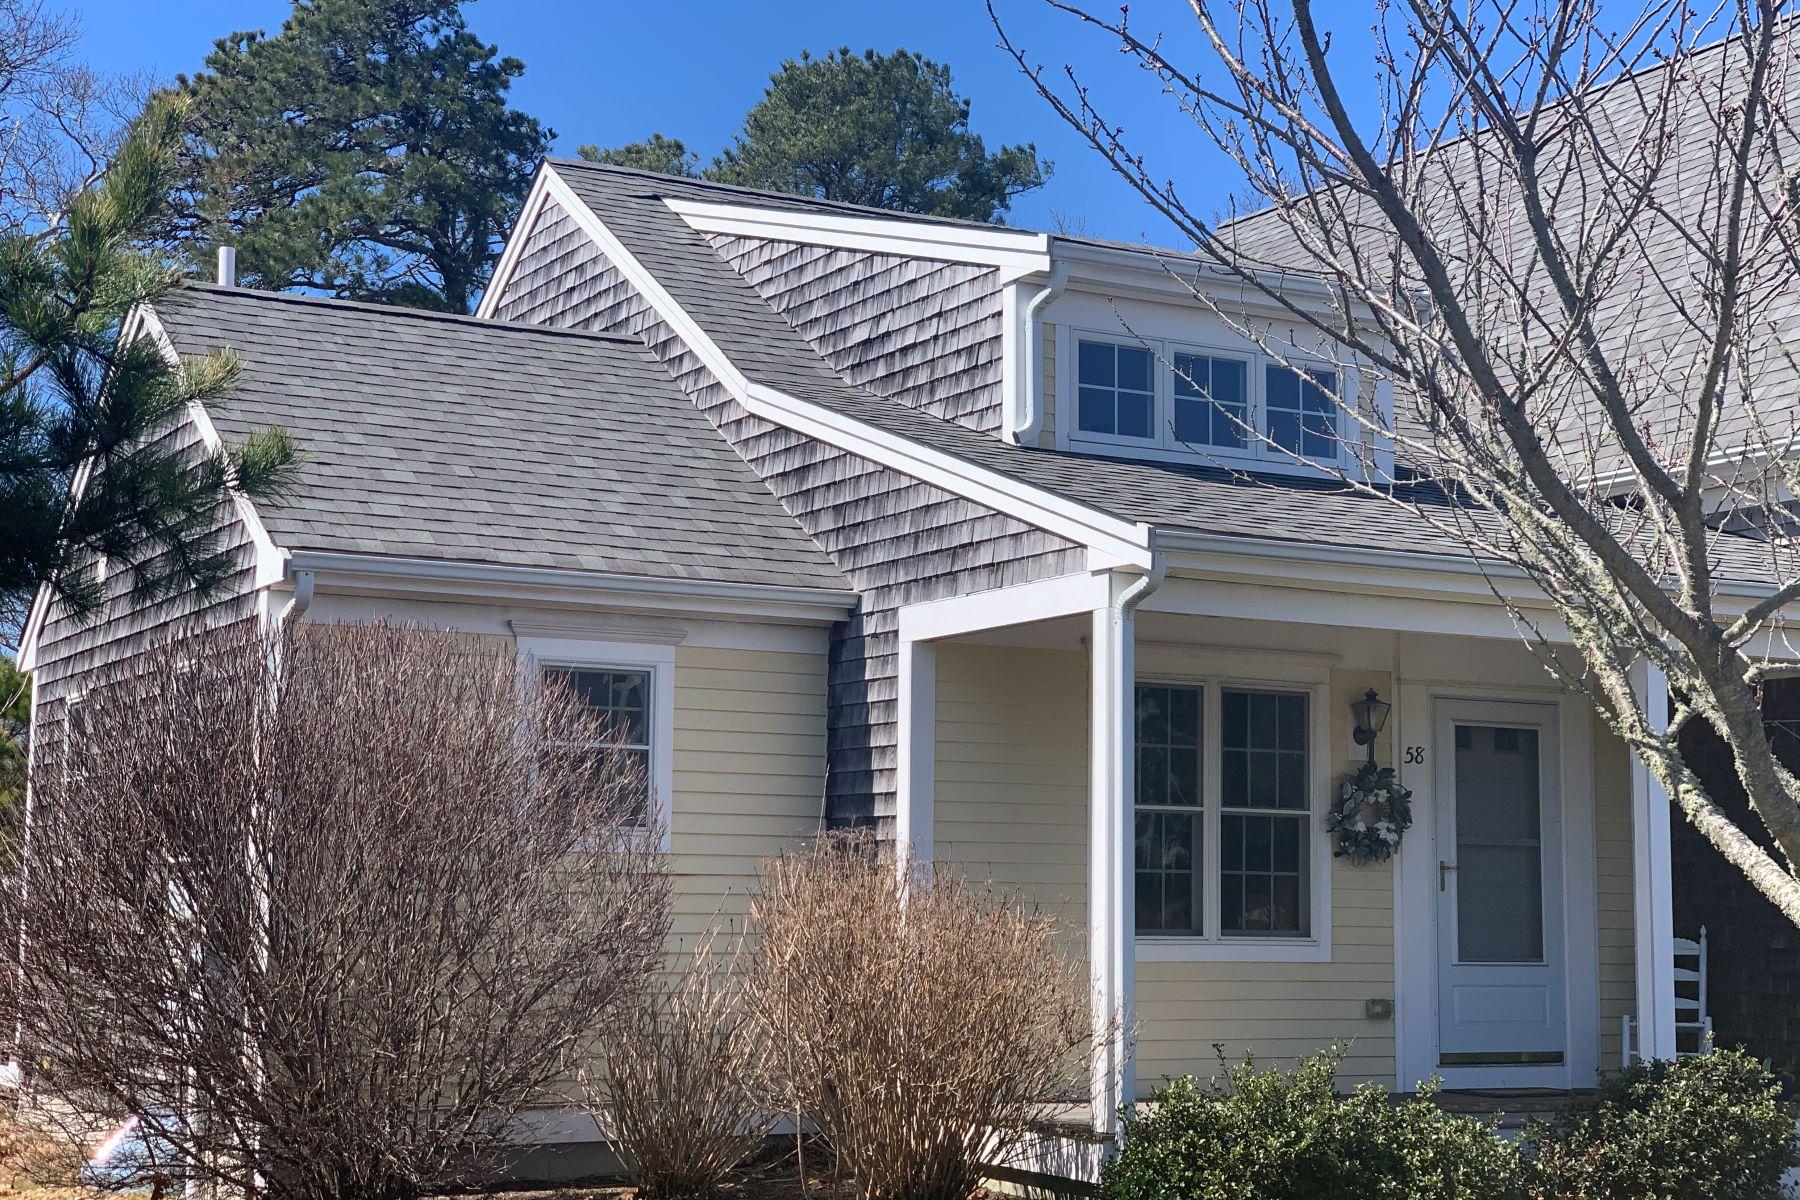 Condominiums για την Πώληση στο 58 Dory Lane, Eastham 58 Dory Ln 4, Eastham, Μασαχουσετη 02642 Ηνωμένες Πολιτείες